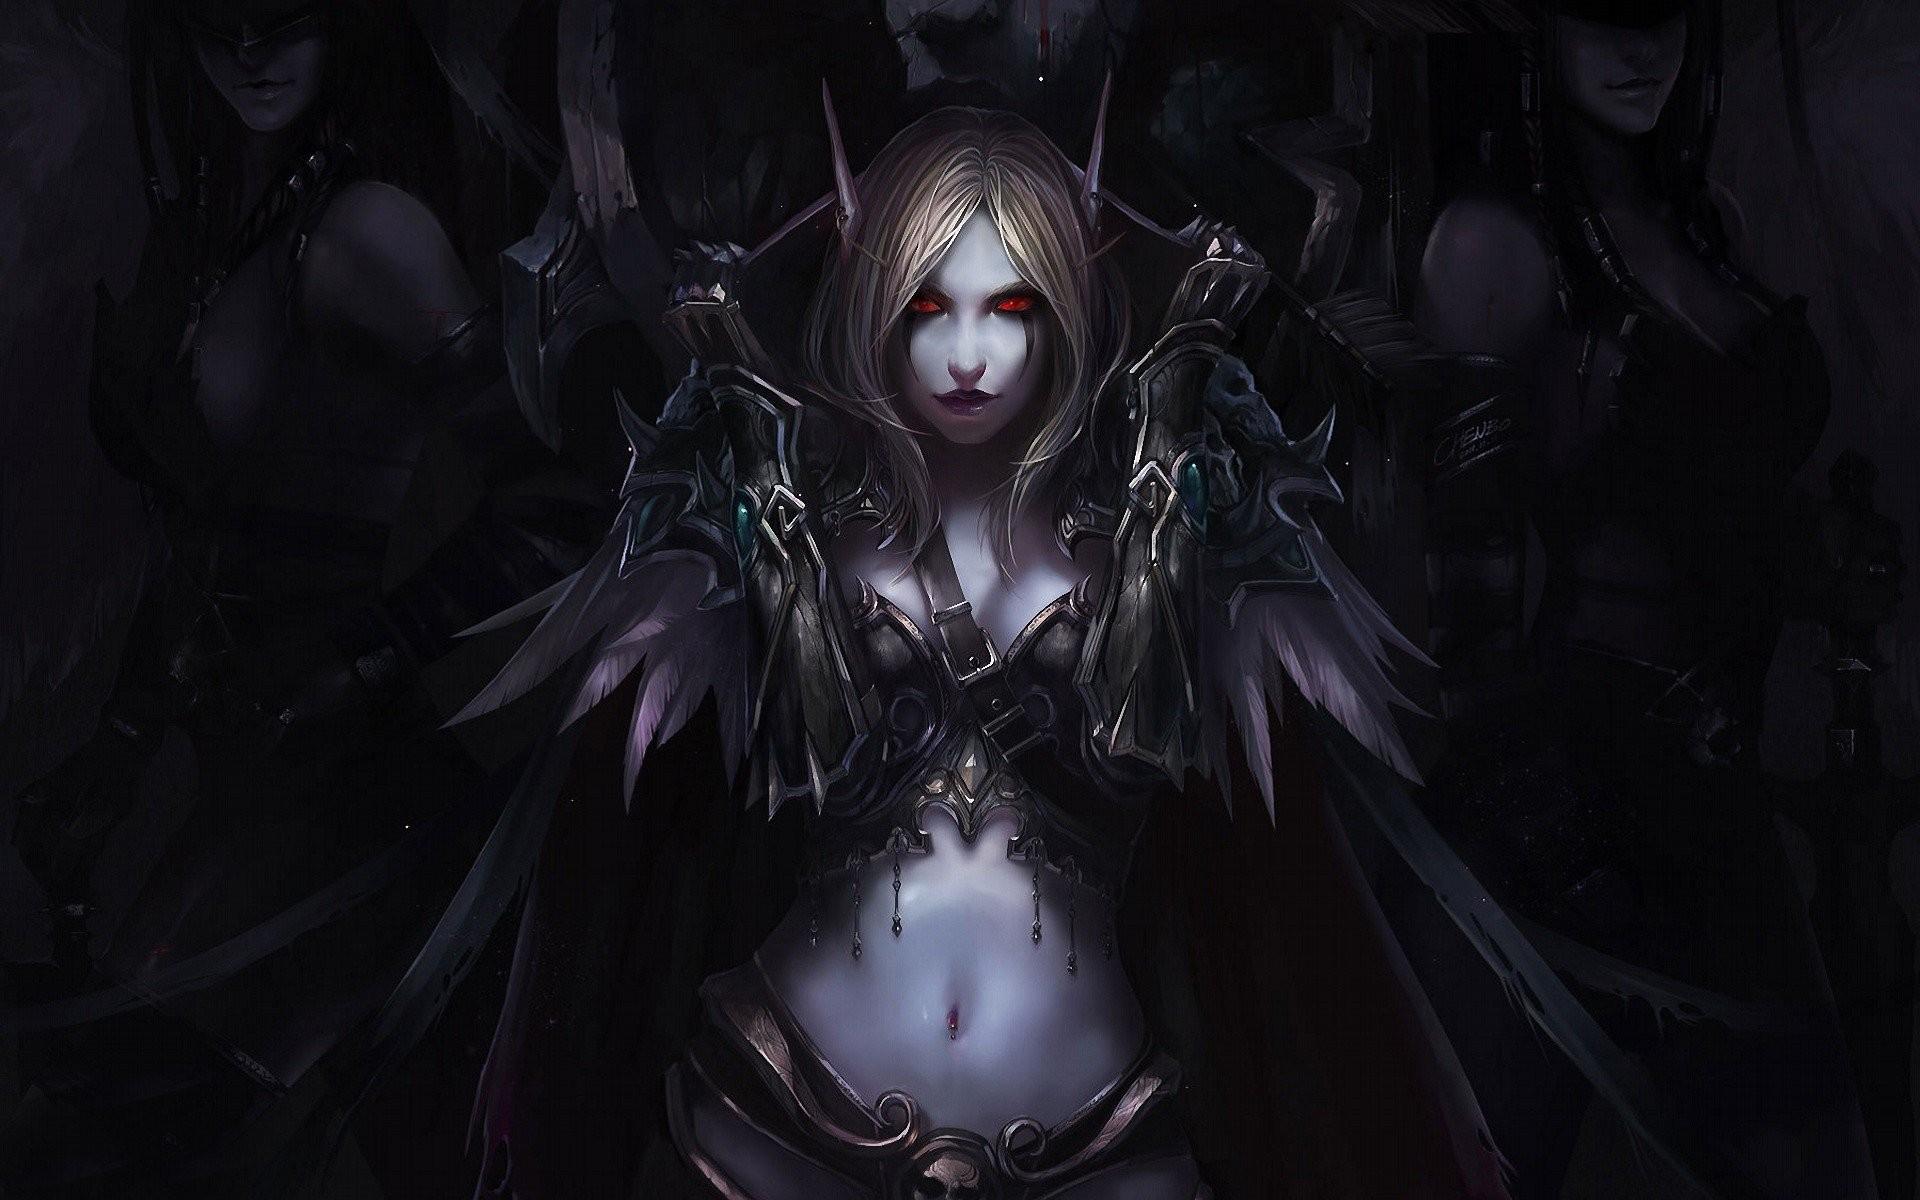 Artwork Elves Fantasy Art Navel Sylvanas Windrunner Video Games Warcraft  WarCraft III Women World Of